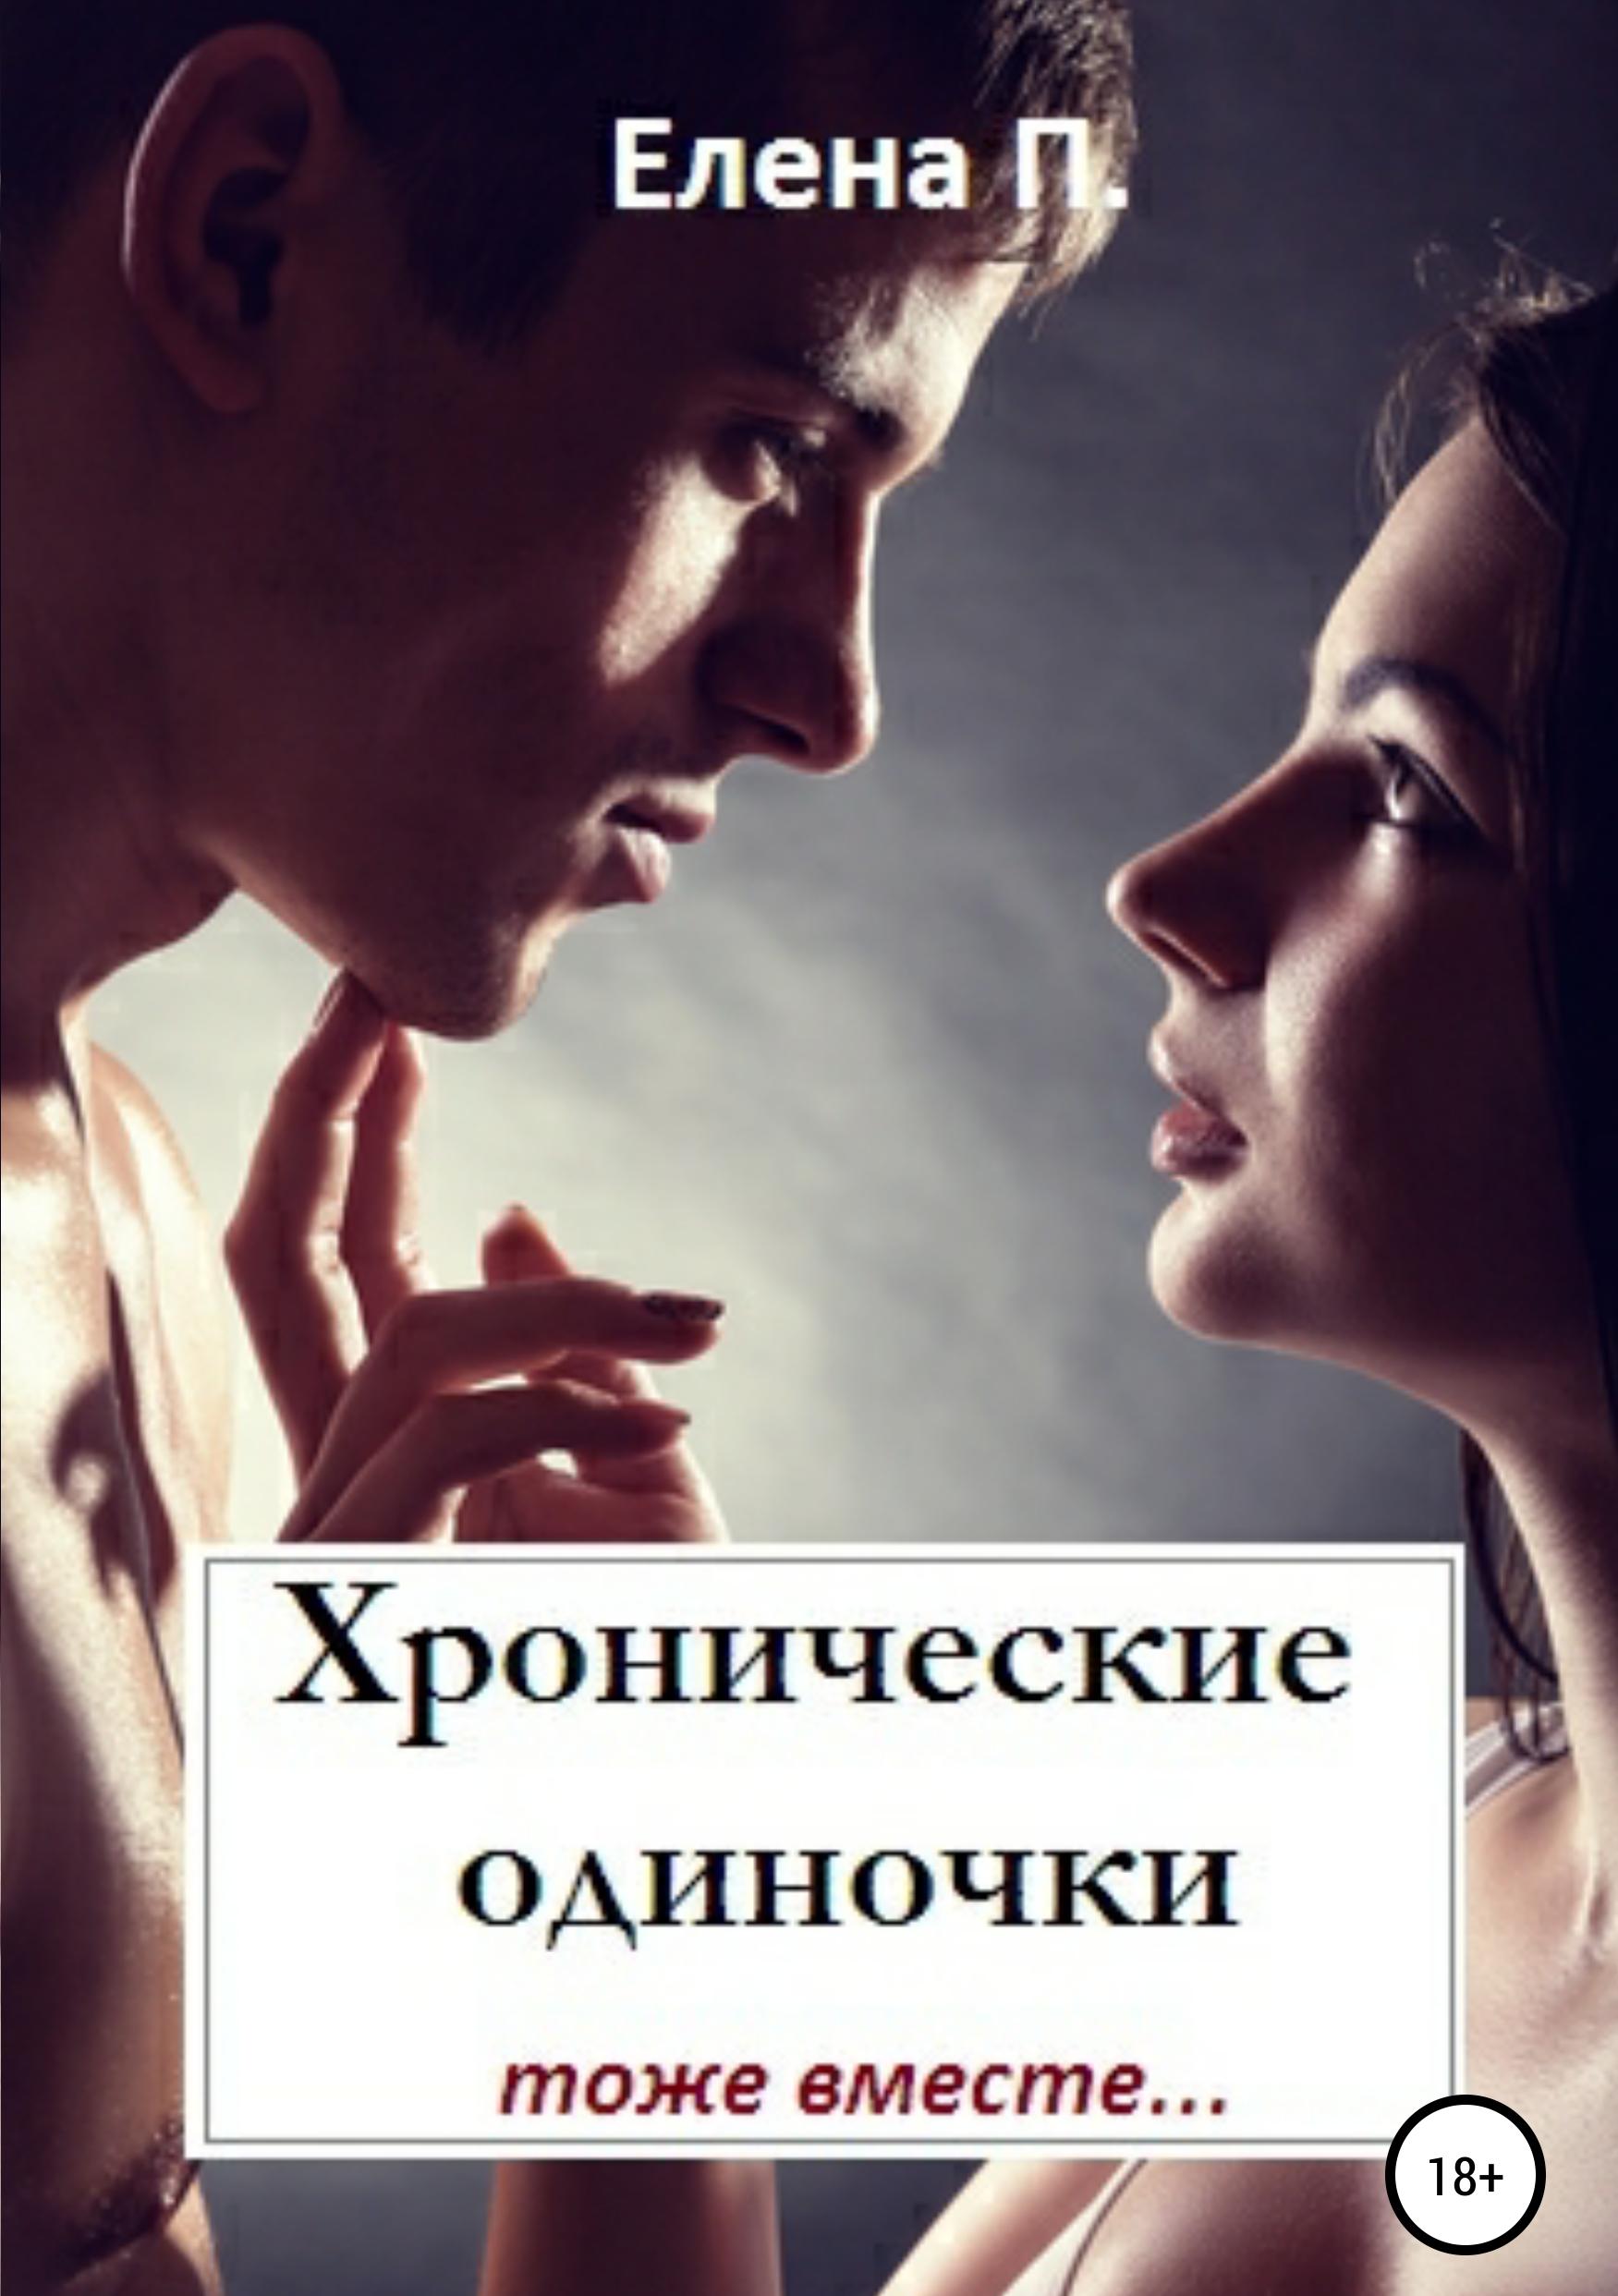 Елена online П. Хронические одиночки тоже вместе